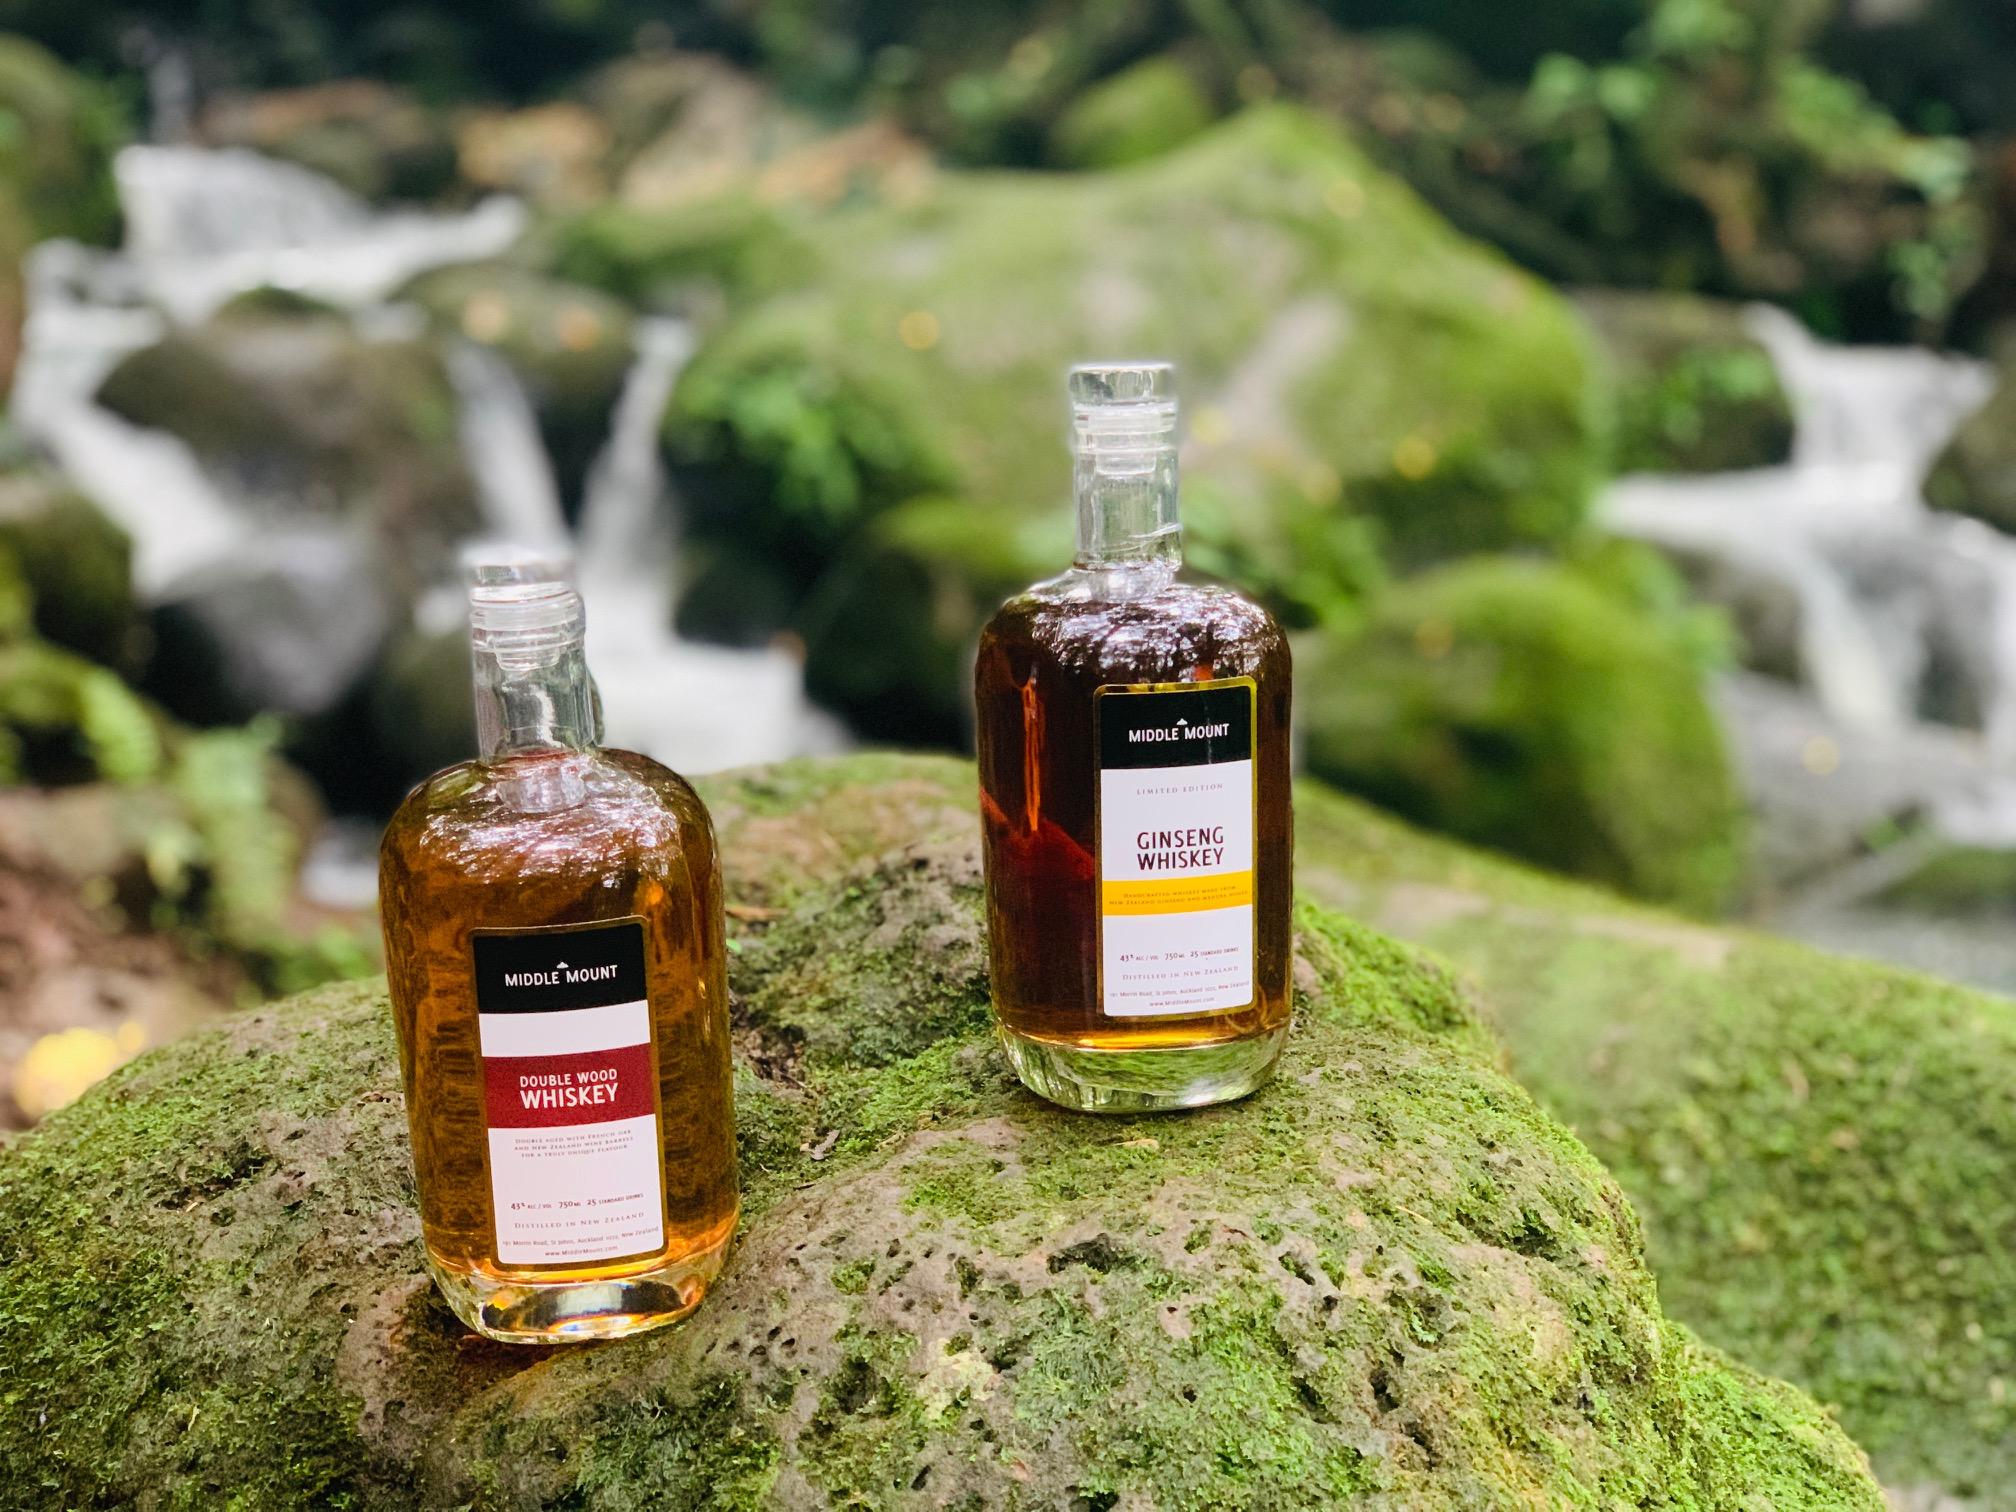 Middle Mount New Zealand Whiskey